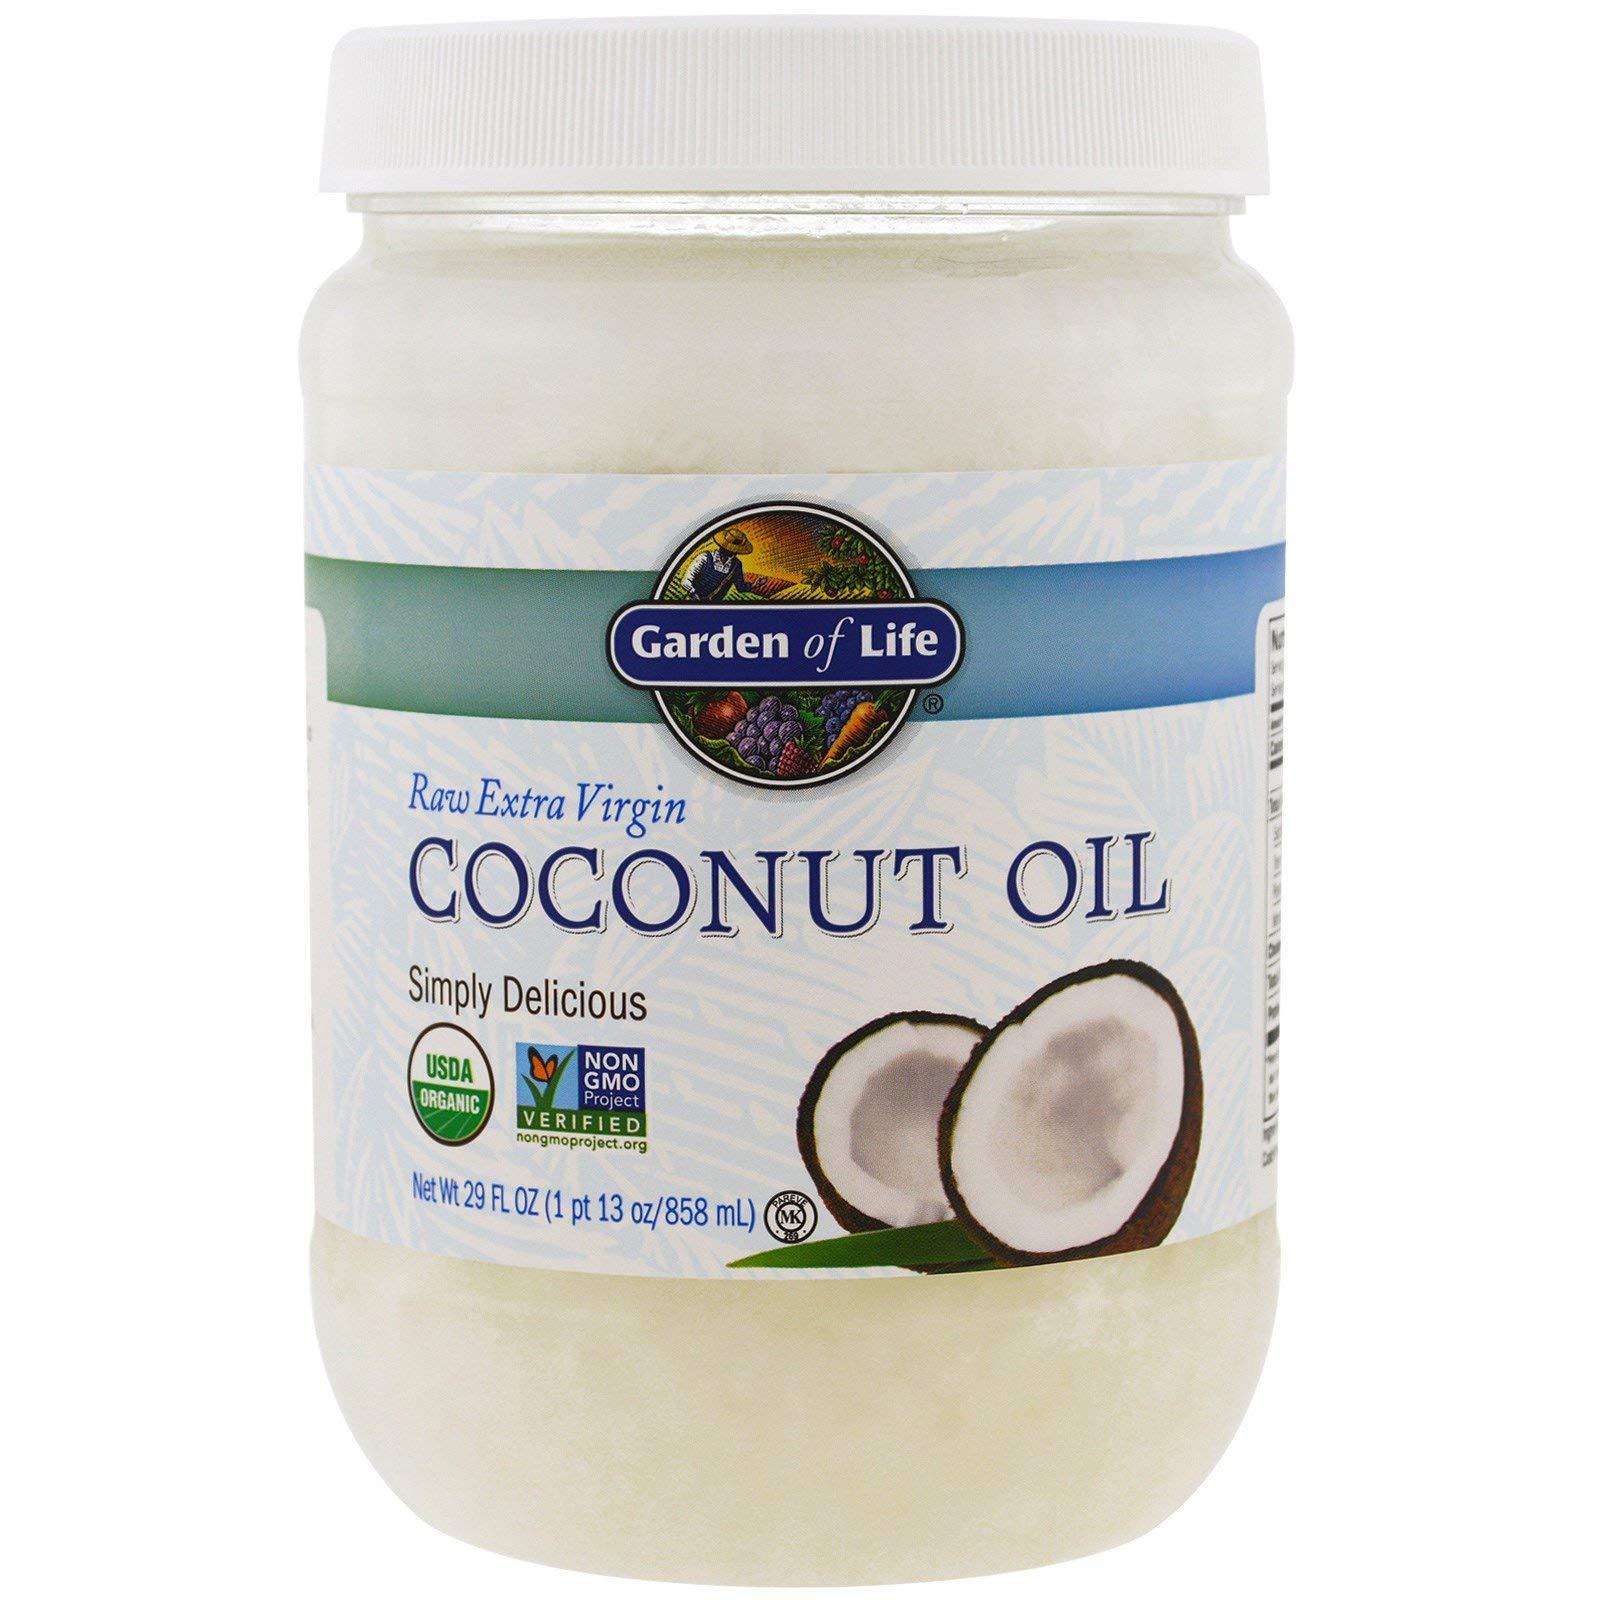 Garden of Life, Raw Extra Virgin Coconut Oil, 29 fl oz (858 ml)